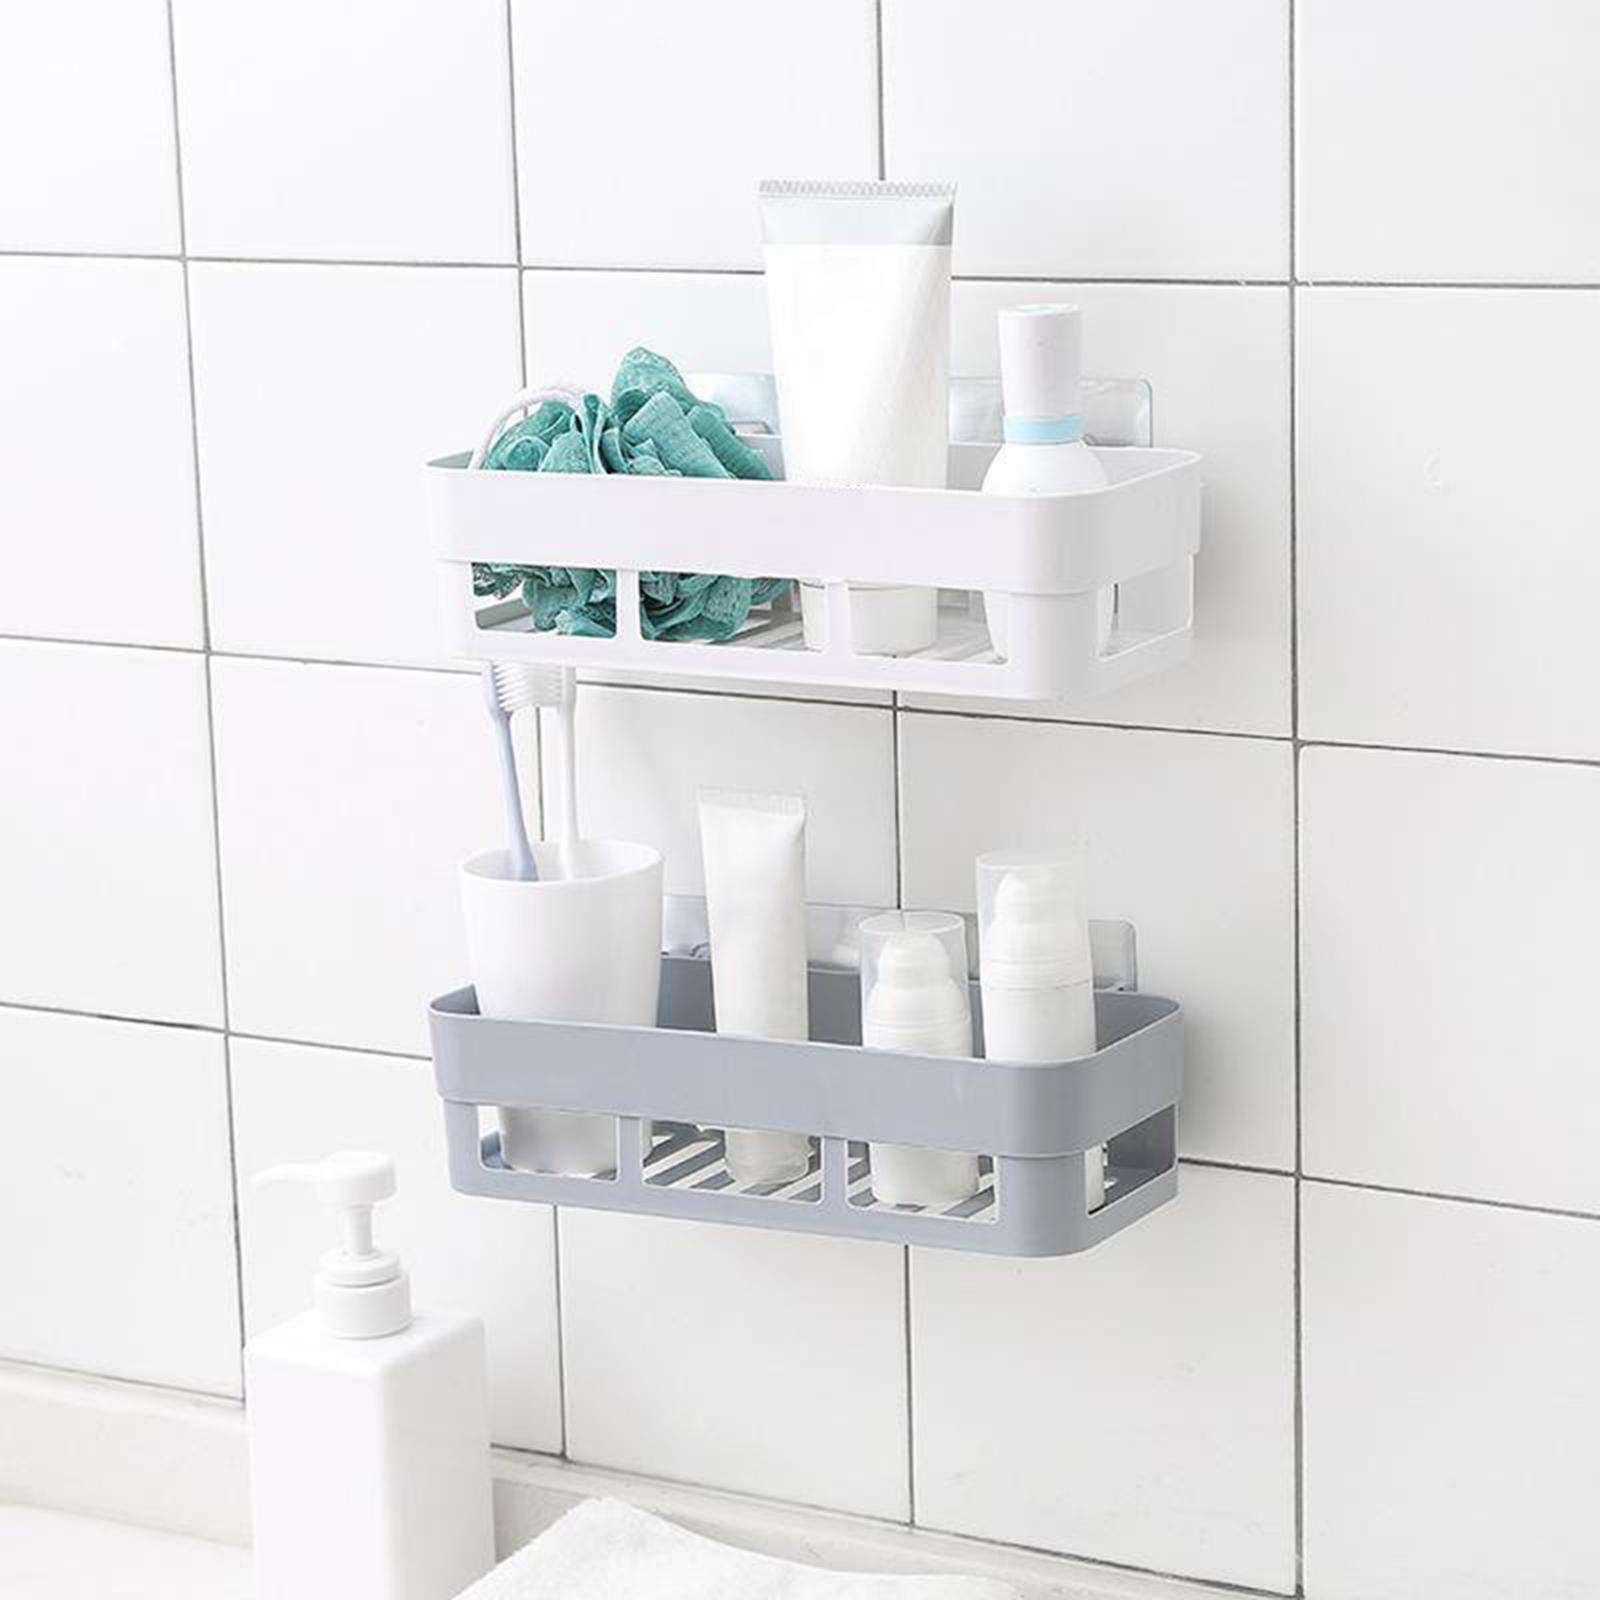 thumbnail 28 - Wall-Suction-Bathroom-Shelf-Shower-Caddy-Wall-Mount-Storage-Rack-Organizer